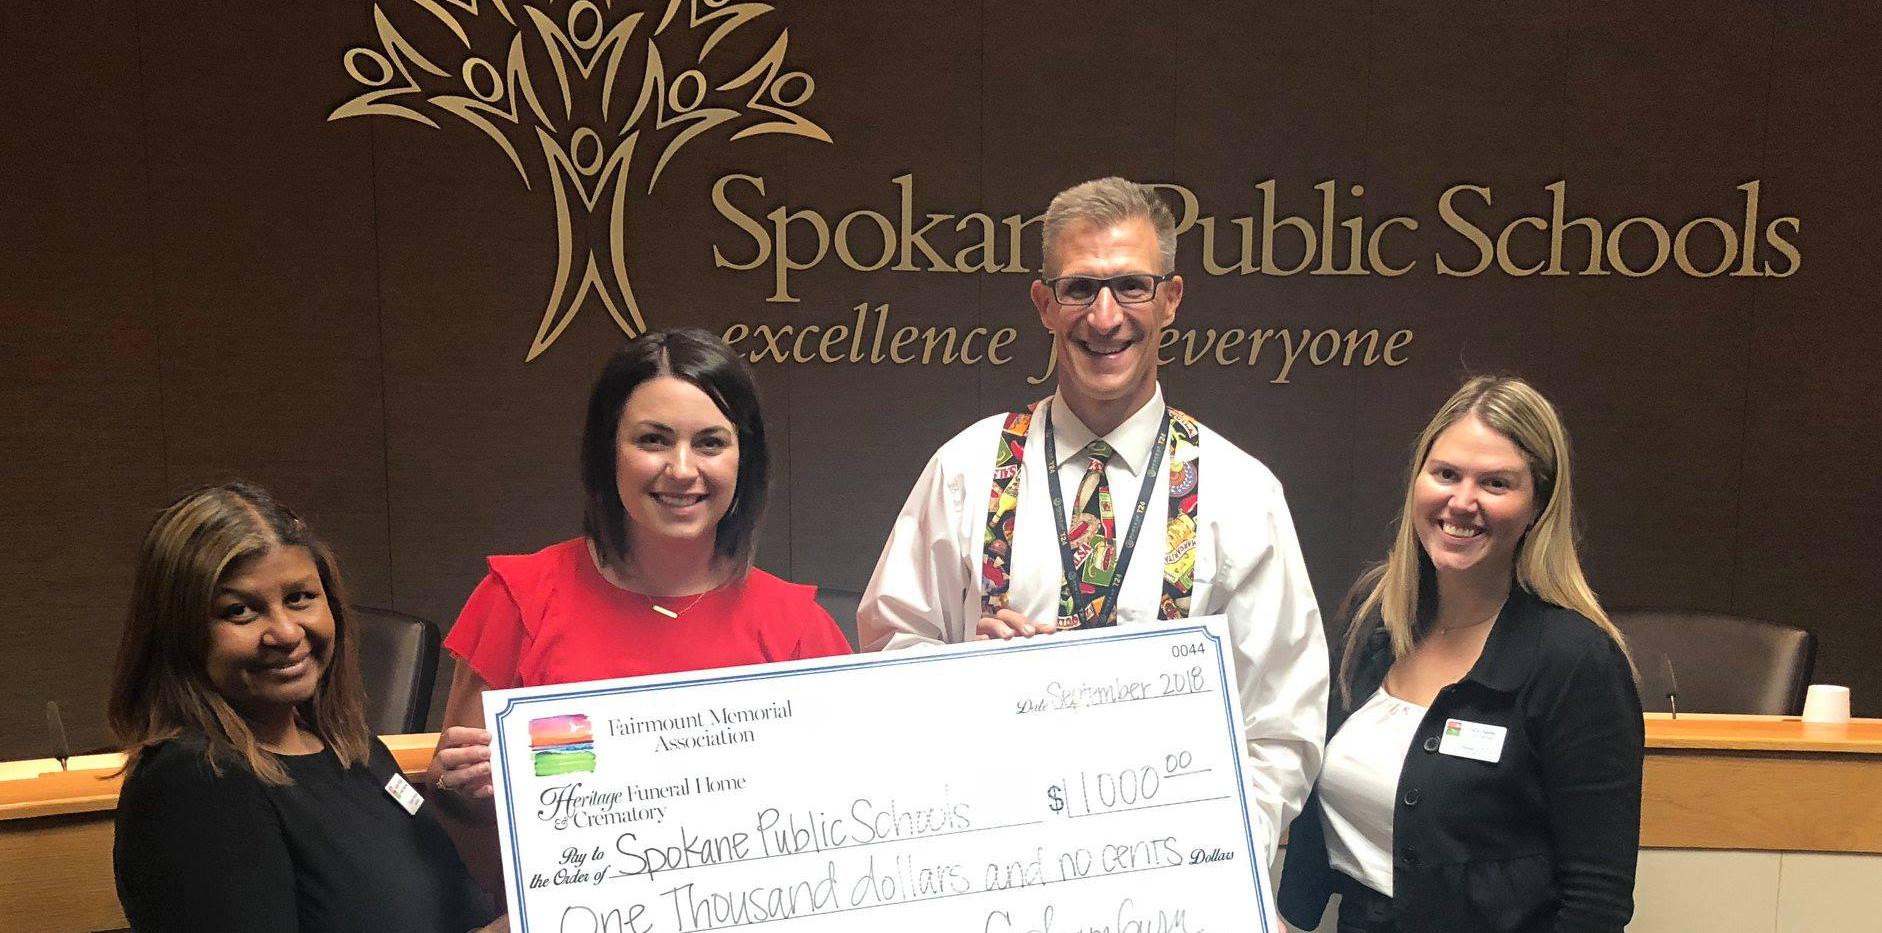 Spokane Public Schools